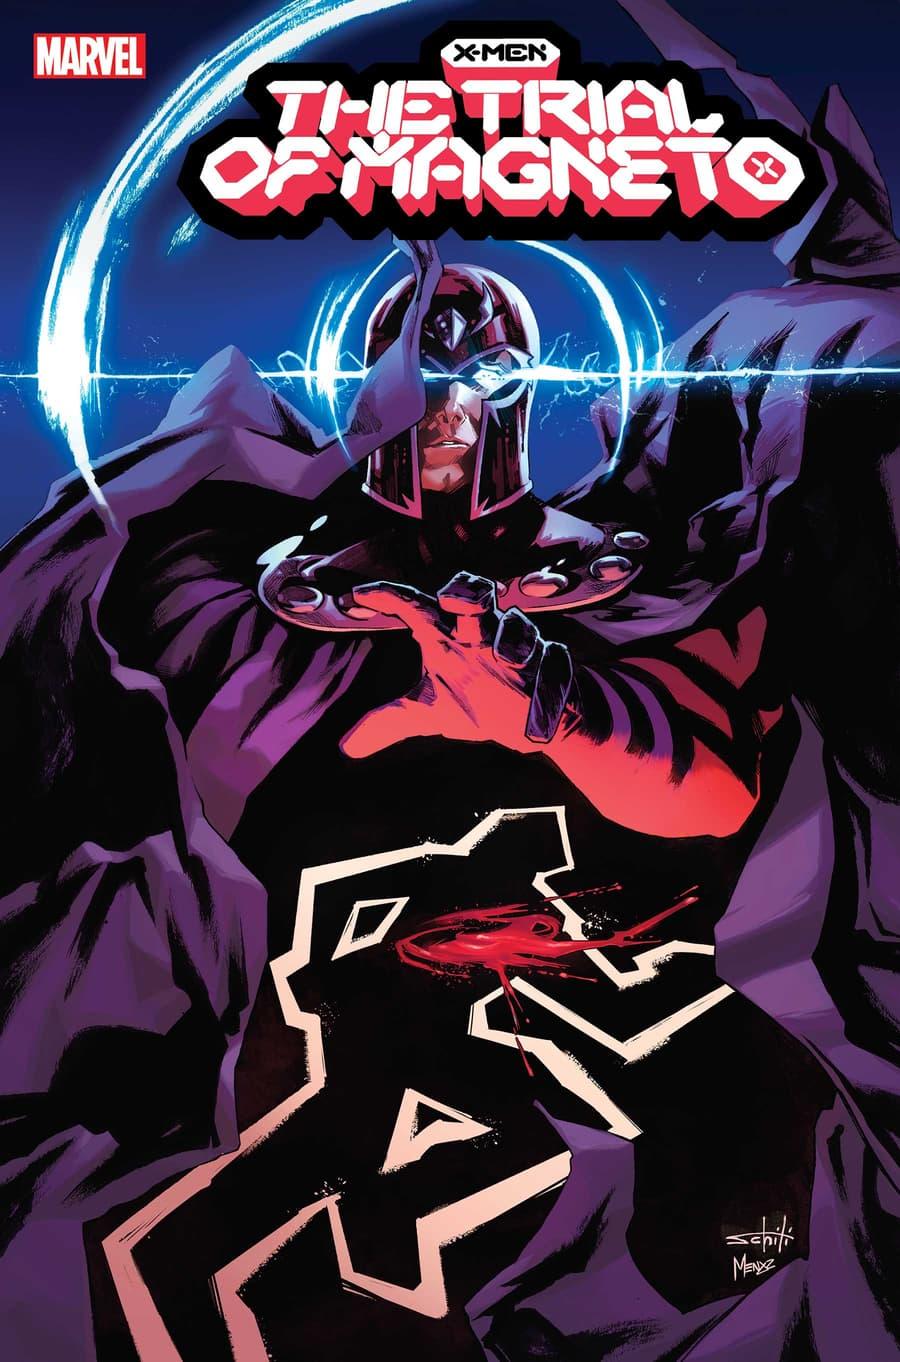 X-MEN: THE TRIAL OF MAGNETO #1 cover by Valerio Schiti